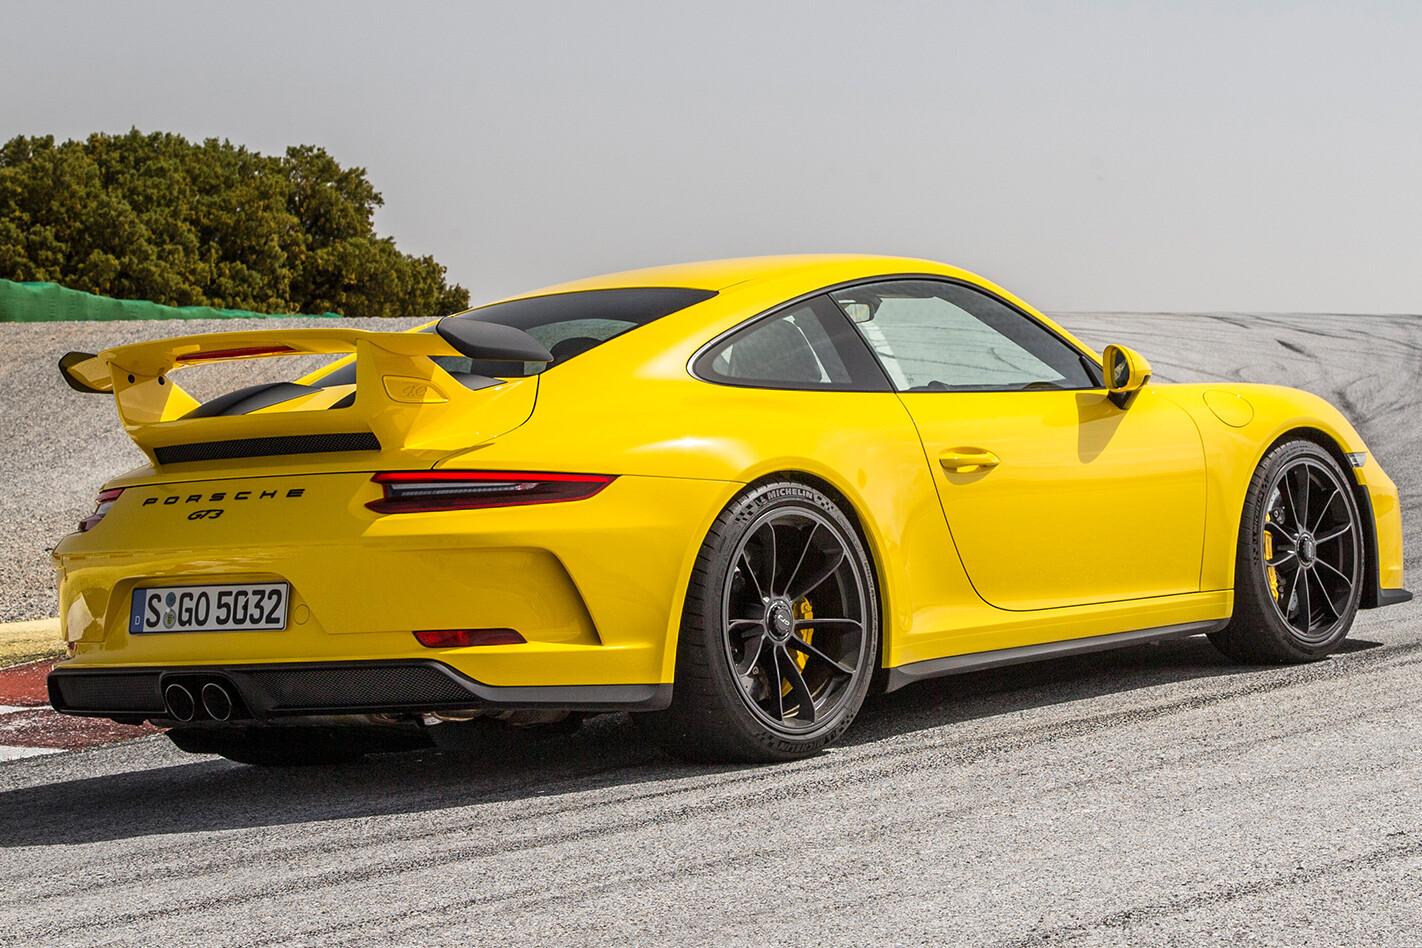 2017 Porsche 911 GT3 manual side profile